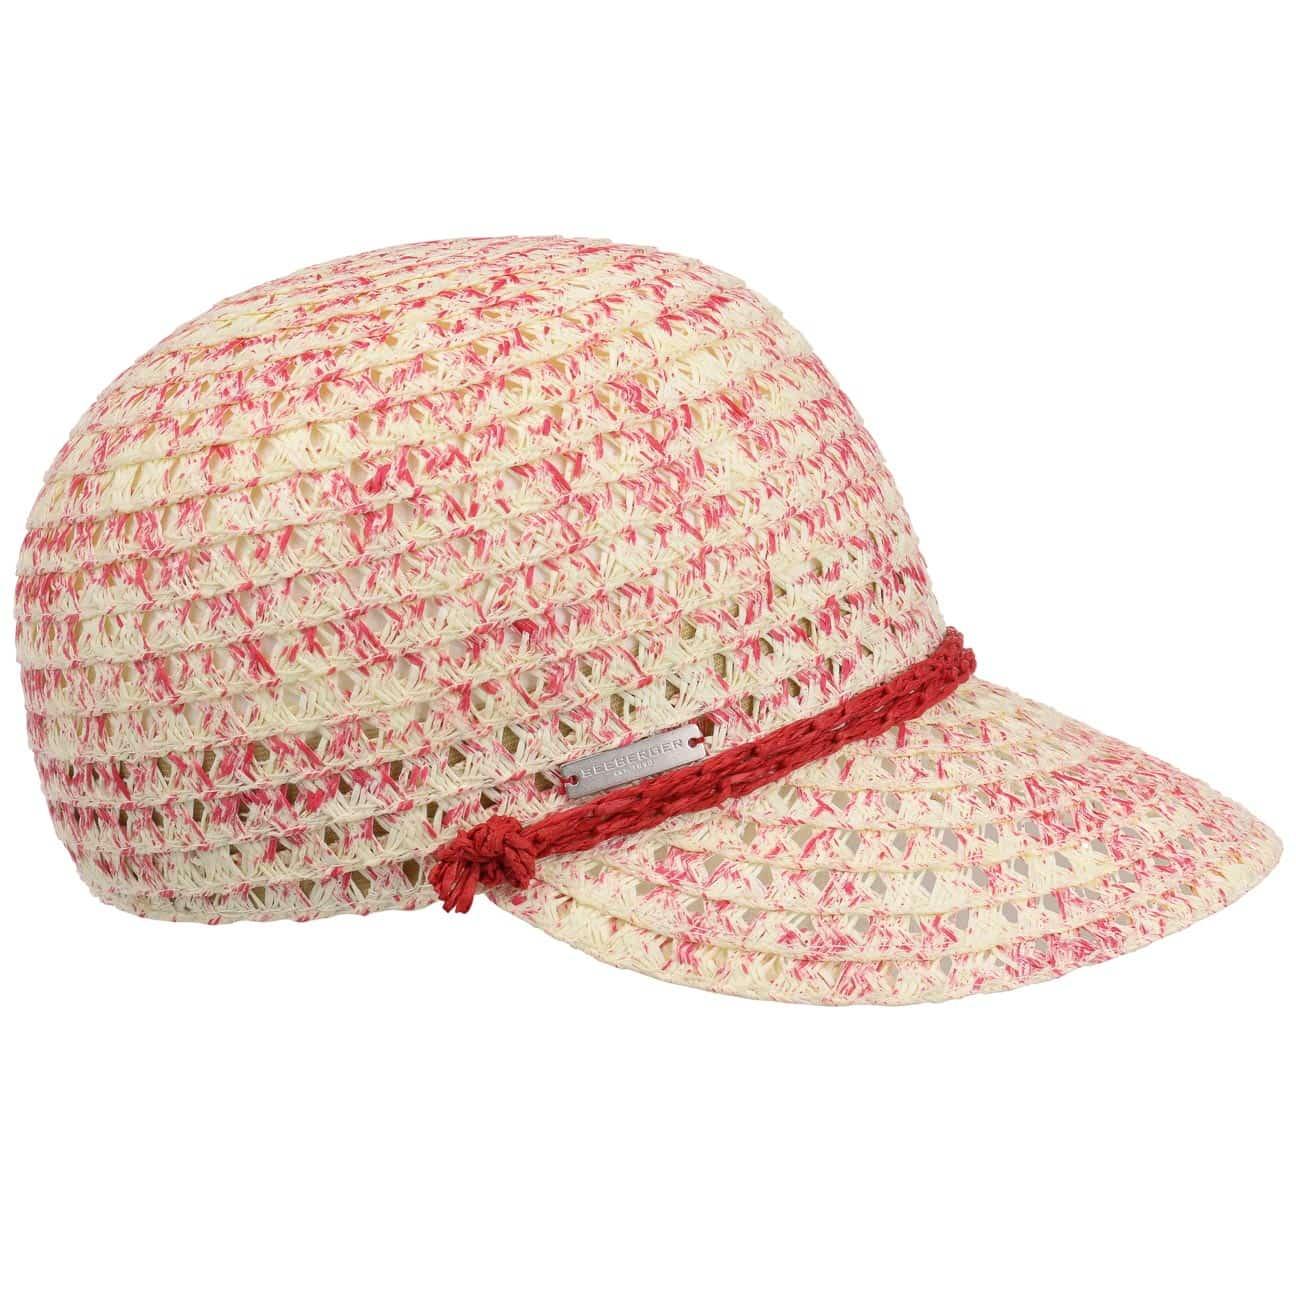 Gorra de Mujer Colourtouch by Seeberger  gorra de sol